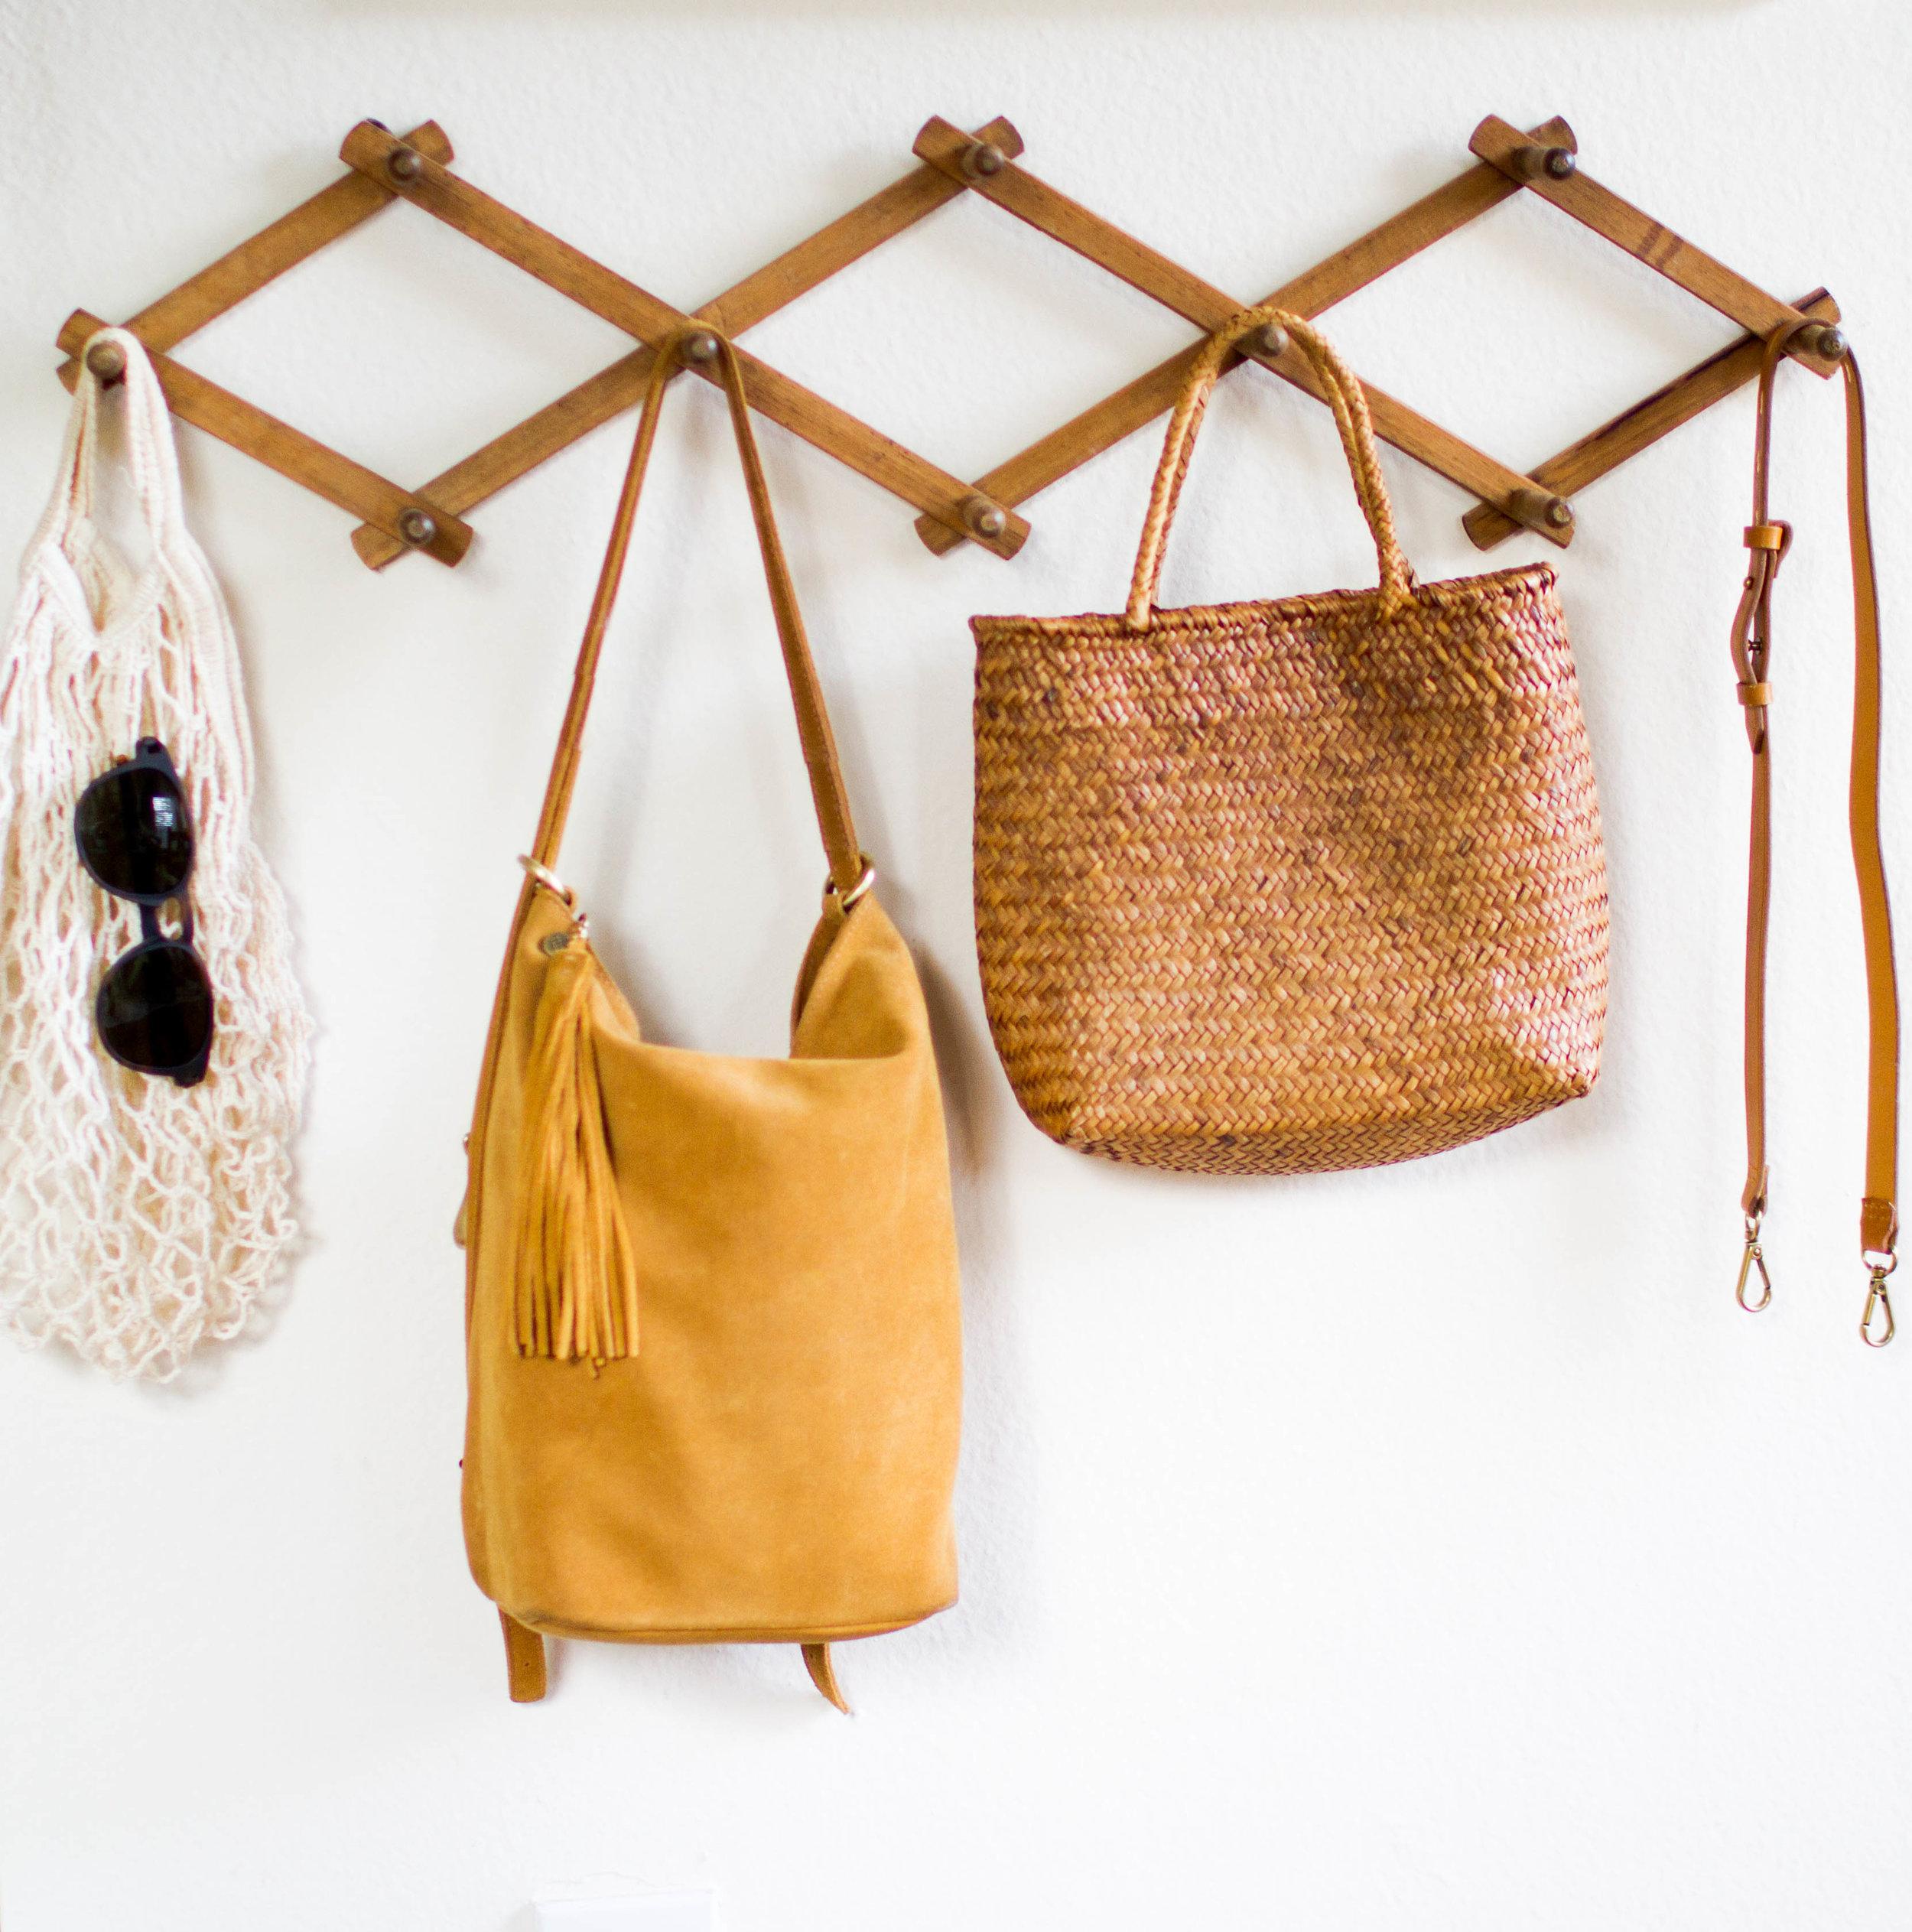 Shop Hobo Reversible Backpack  HERE    Shop $3 fish net bag  HERE   Shop similar straw bag  HERE   Shop Expandable rack  HERE